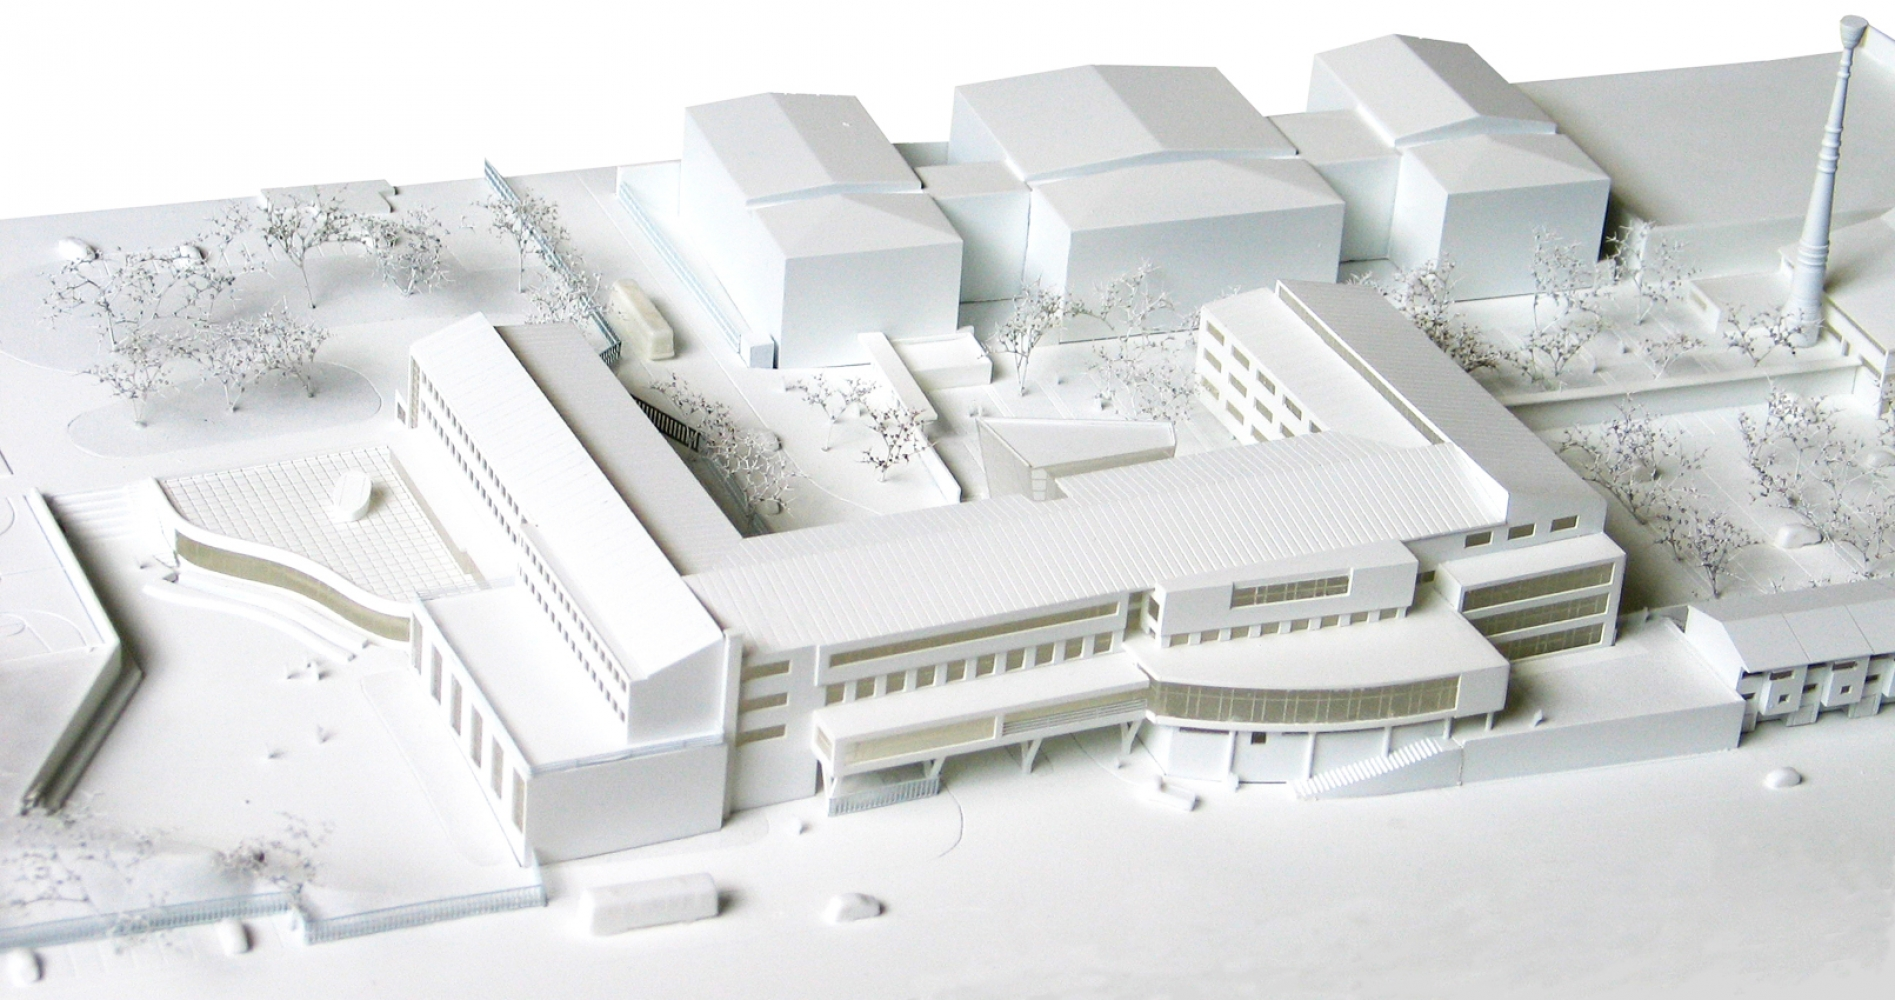 epe---03 Pascale SEURIN Architecte - Pascale SEURIN Architecte